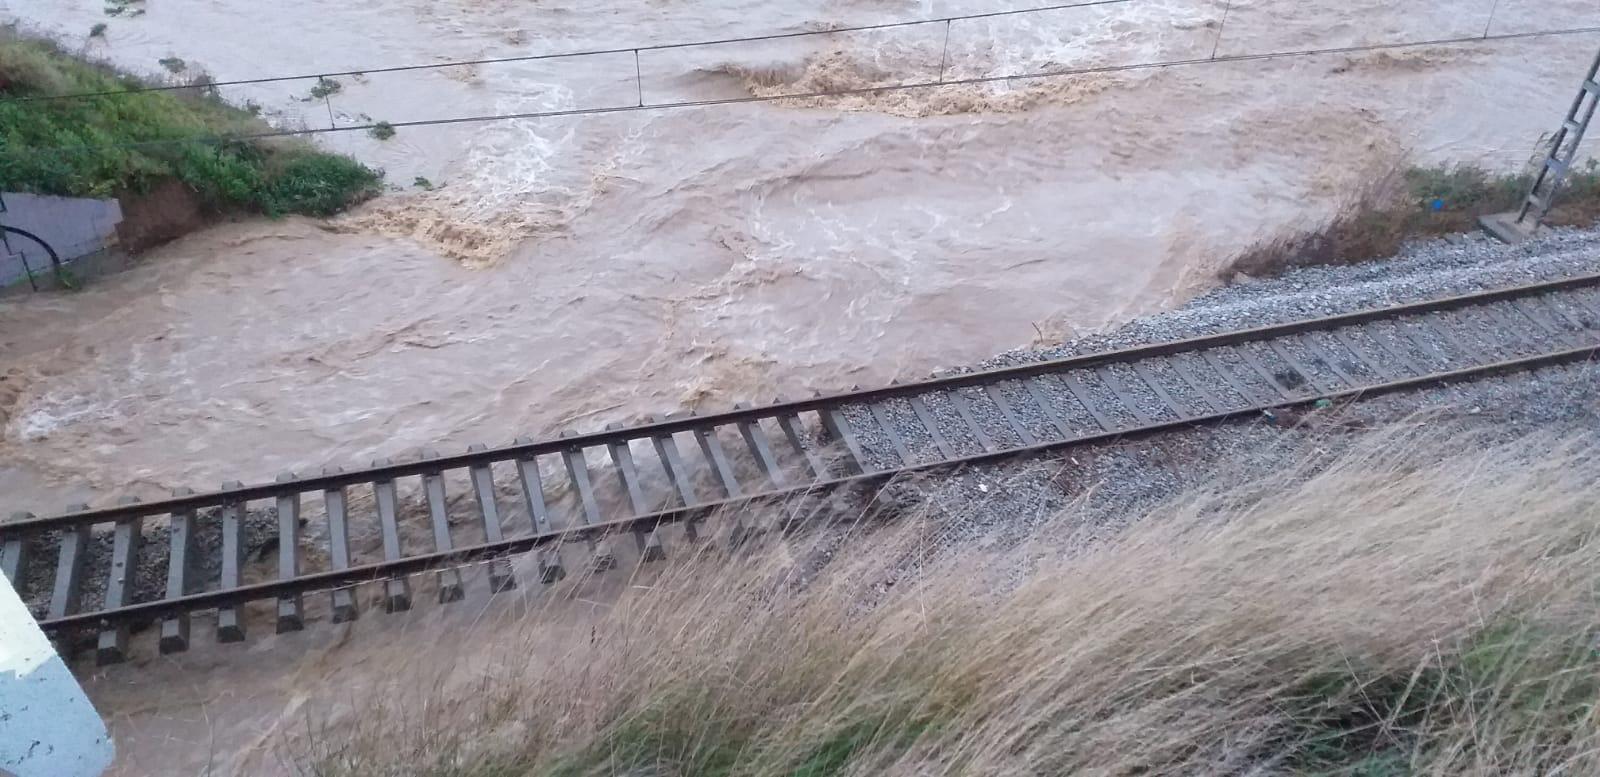 inundacions vies de tren renfe rodalies